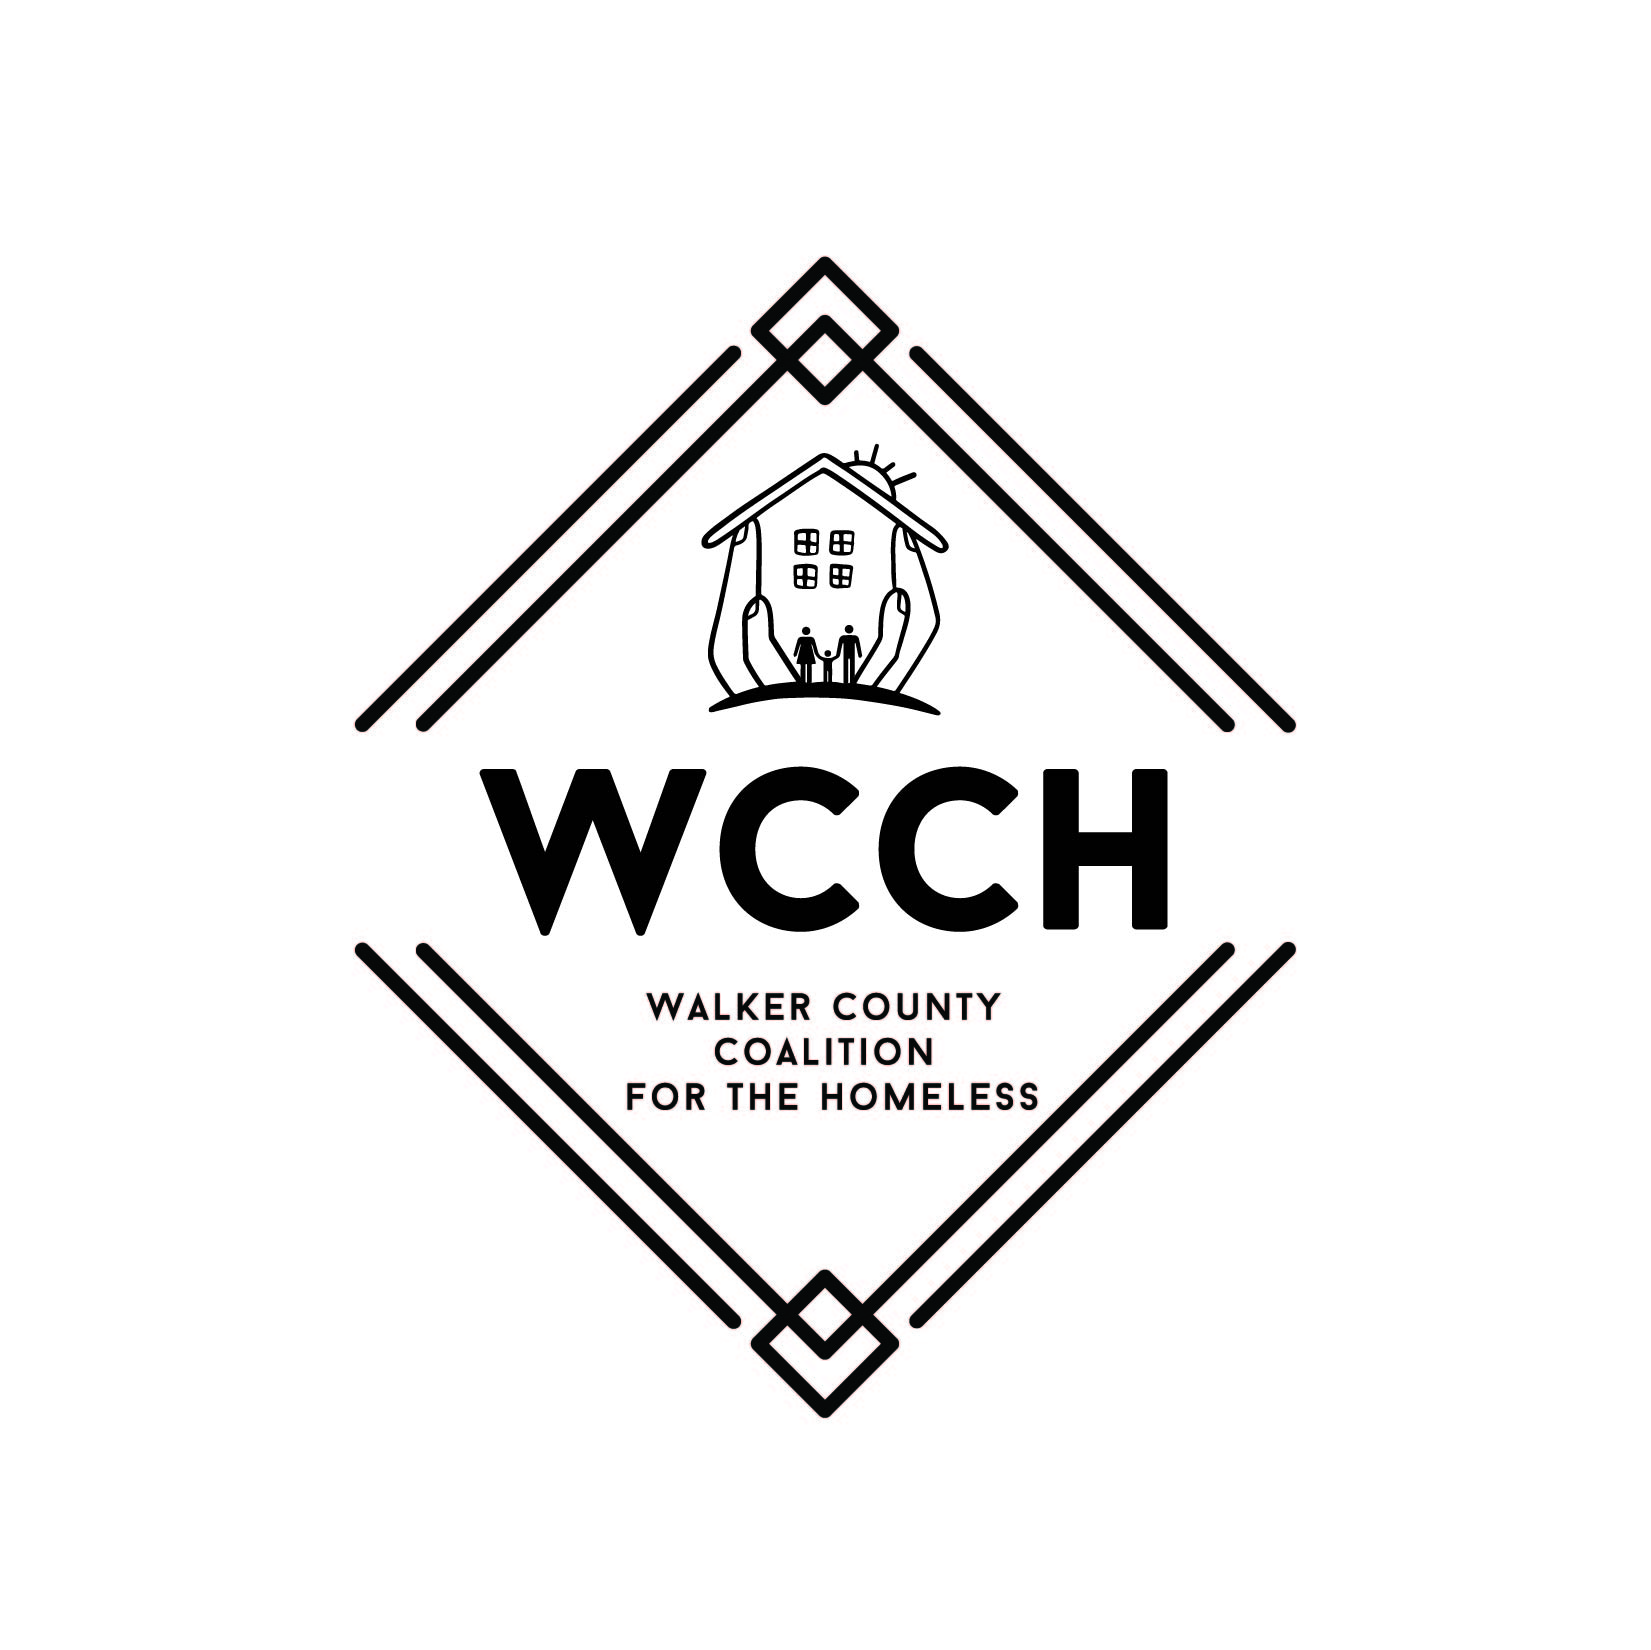 Walker County Coalition for the Homeless - GuideStar Profile